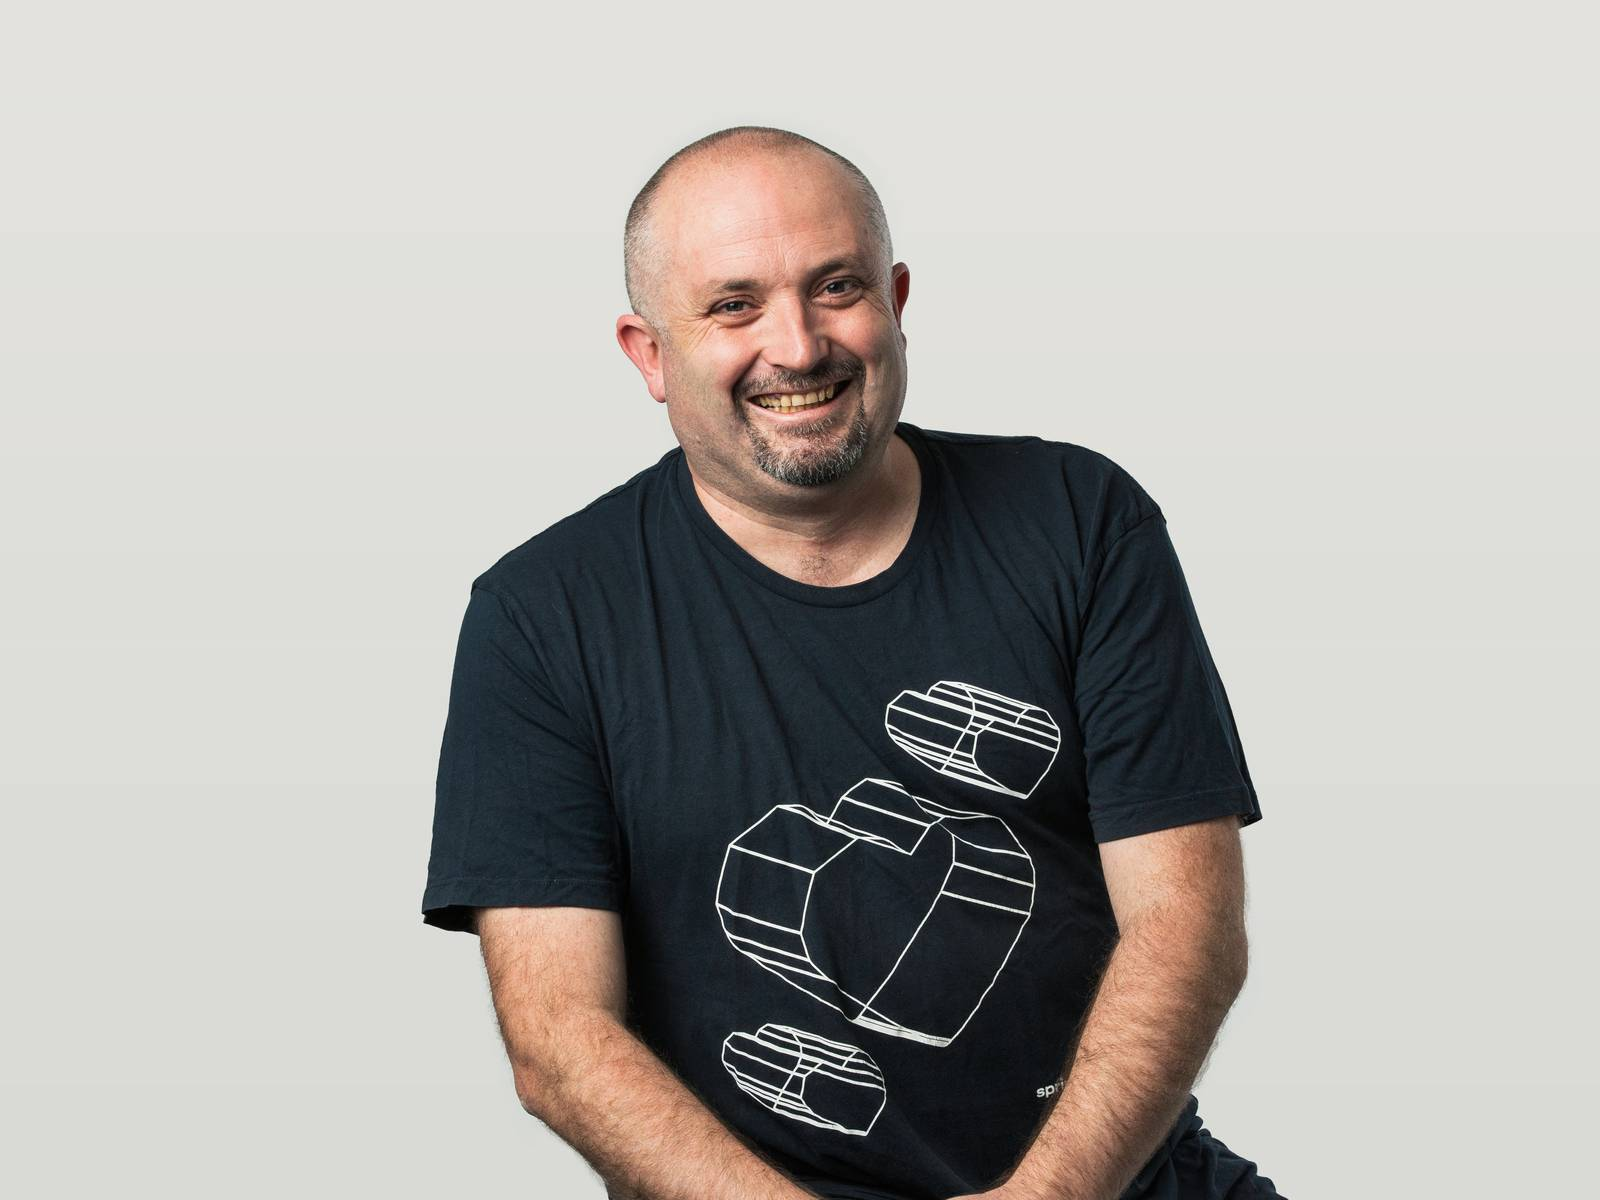 A profile image of John Anderson